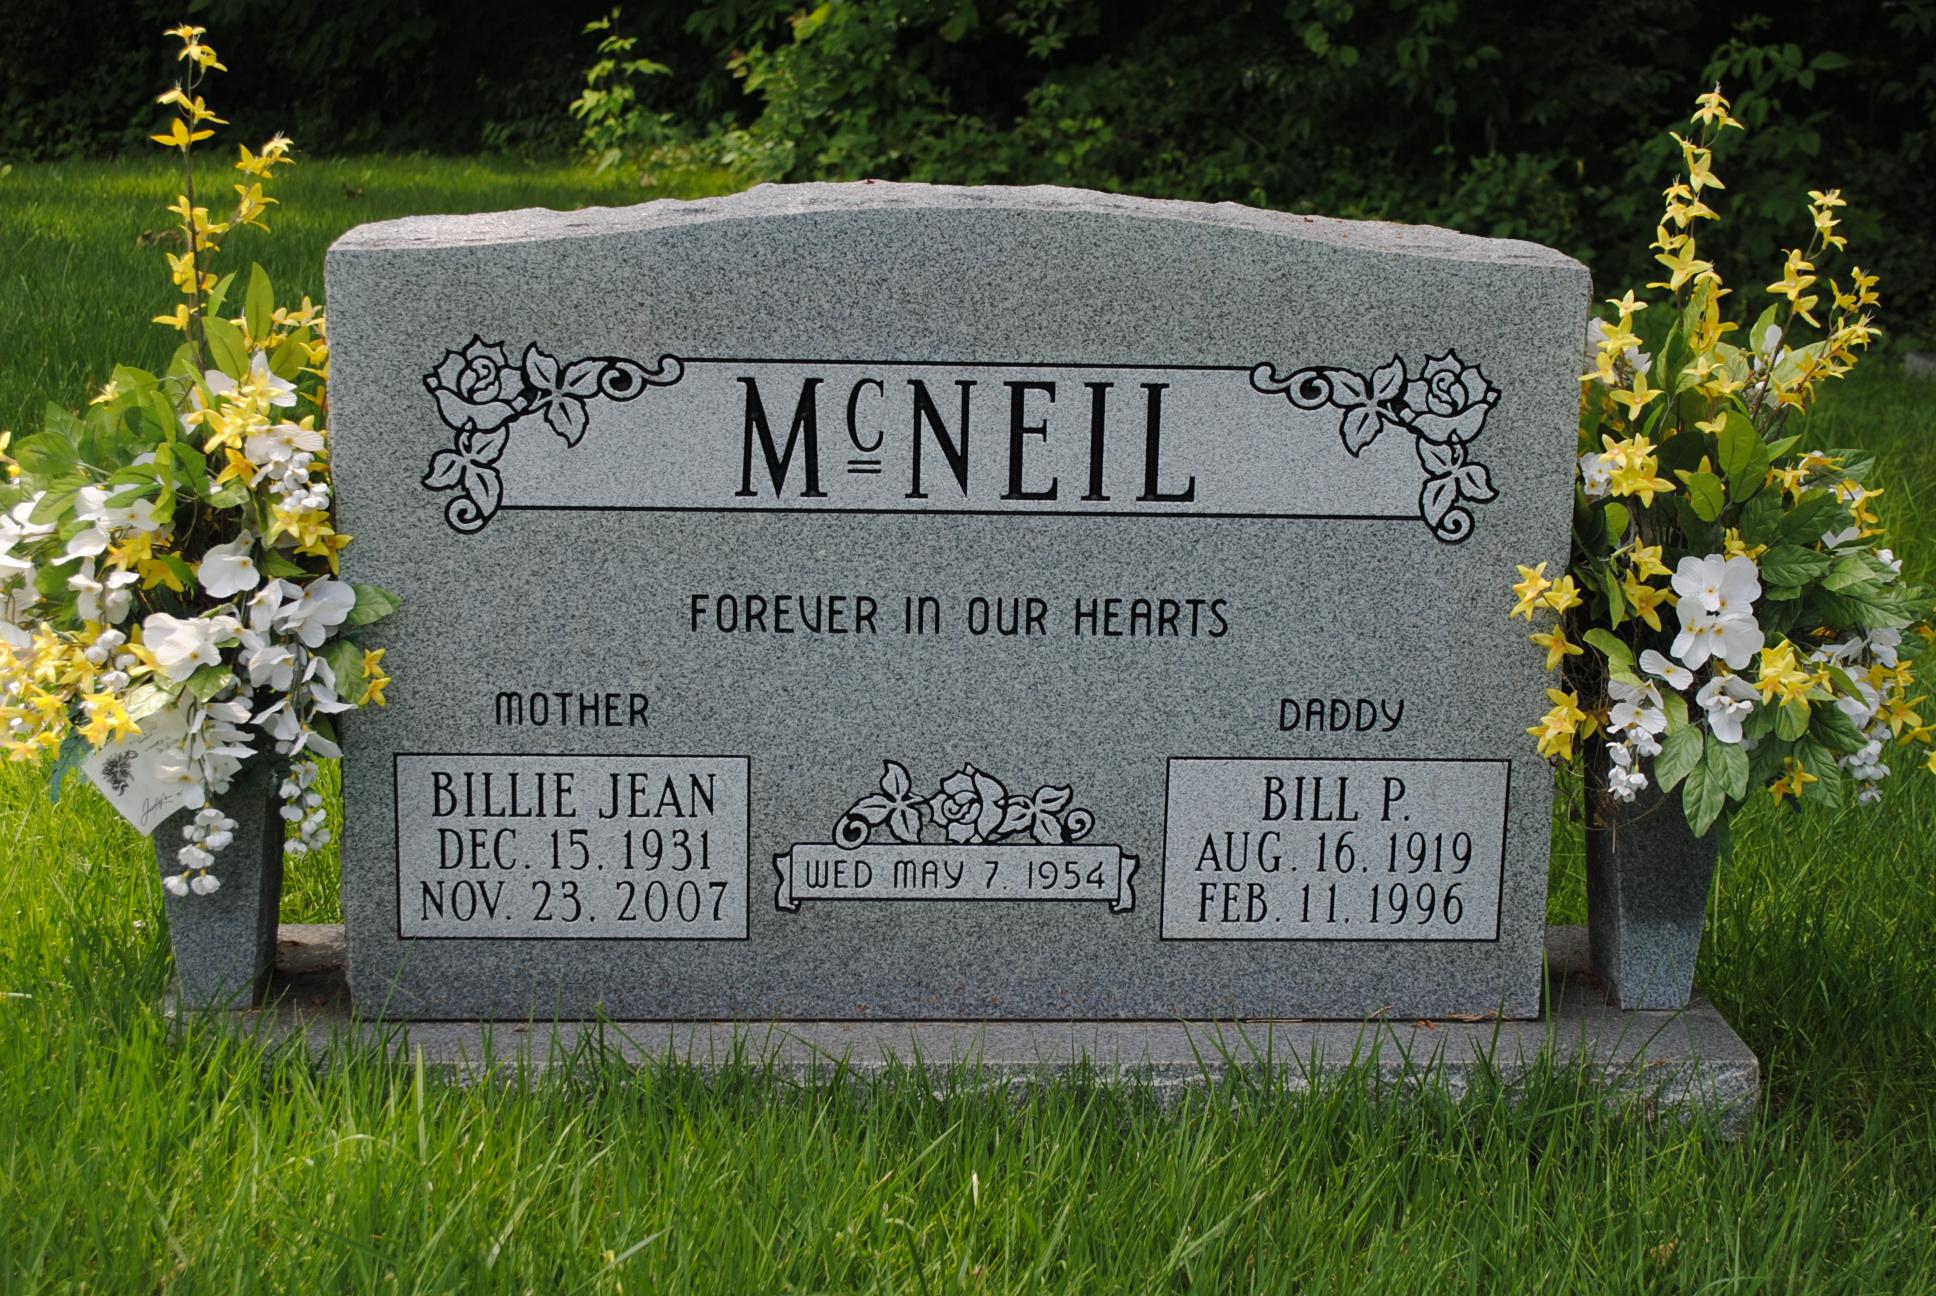 Billy Jean McNiel